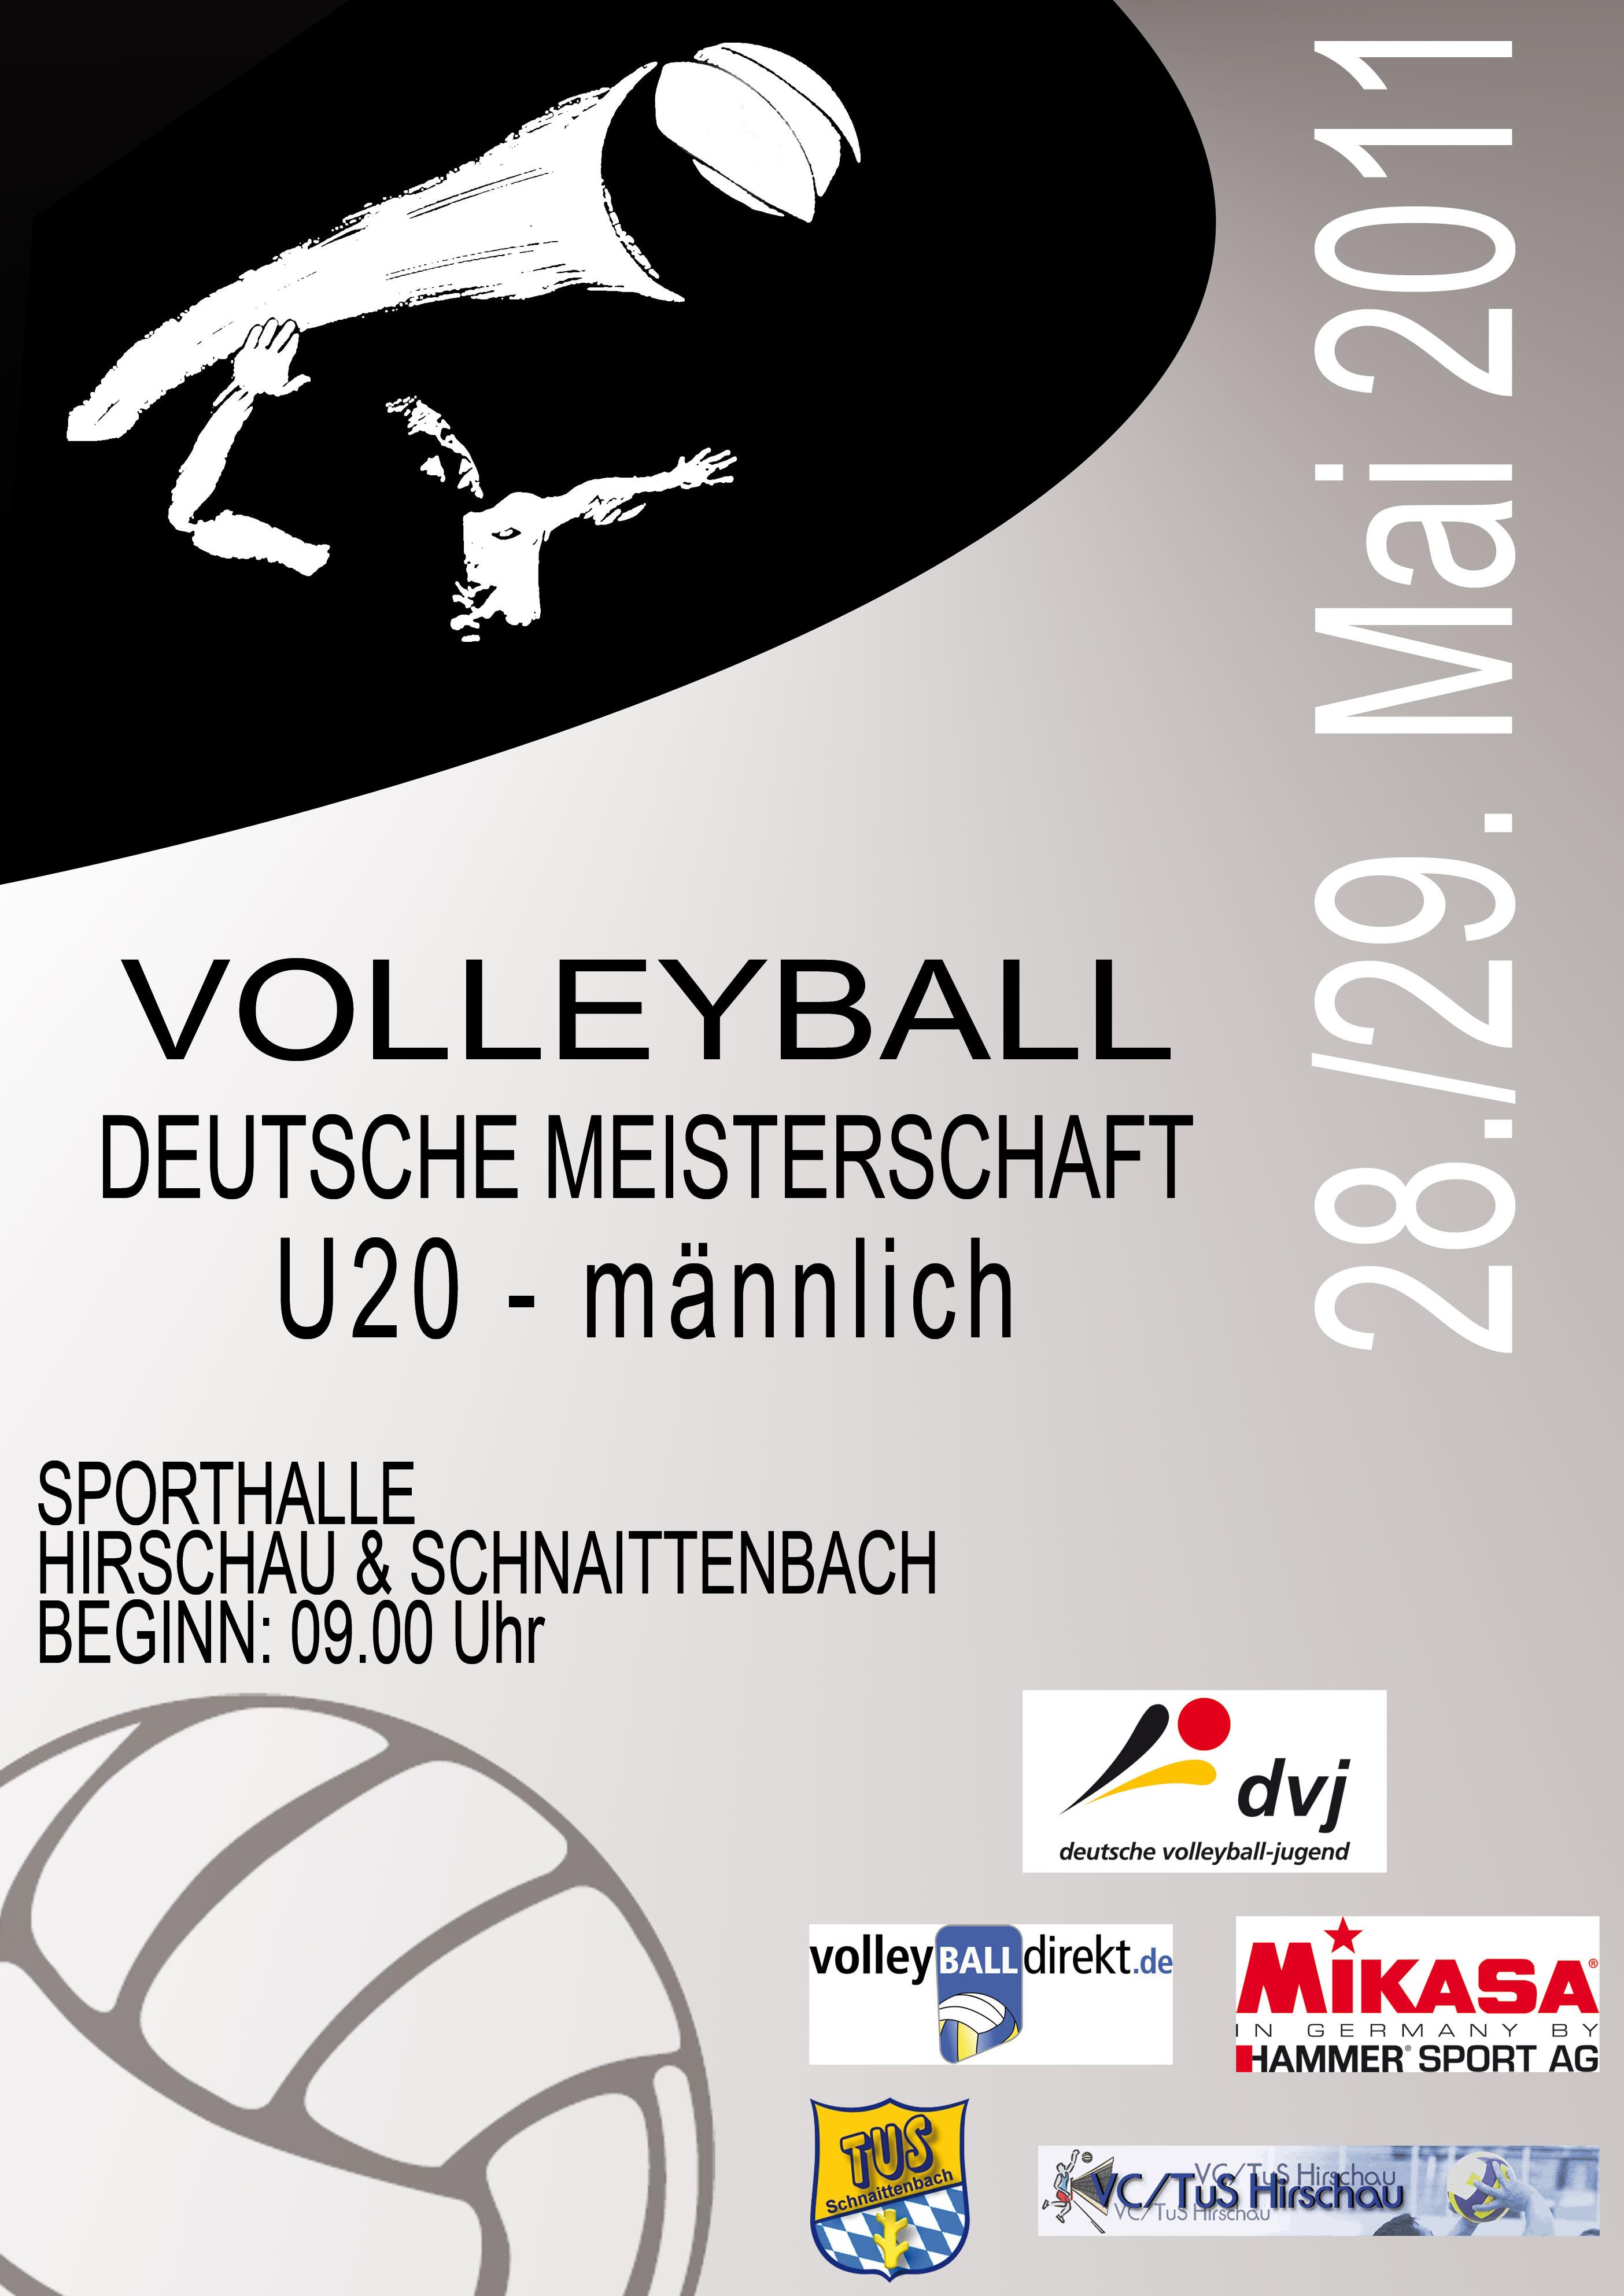 Plakat_Deutsche_Meisterschaft_U20